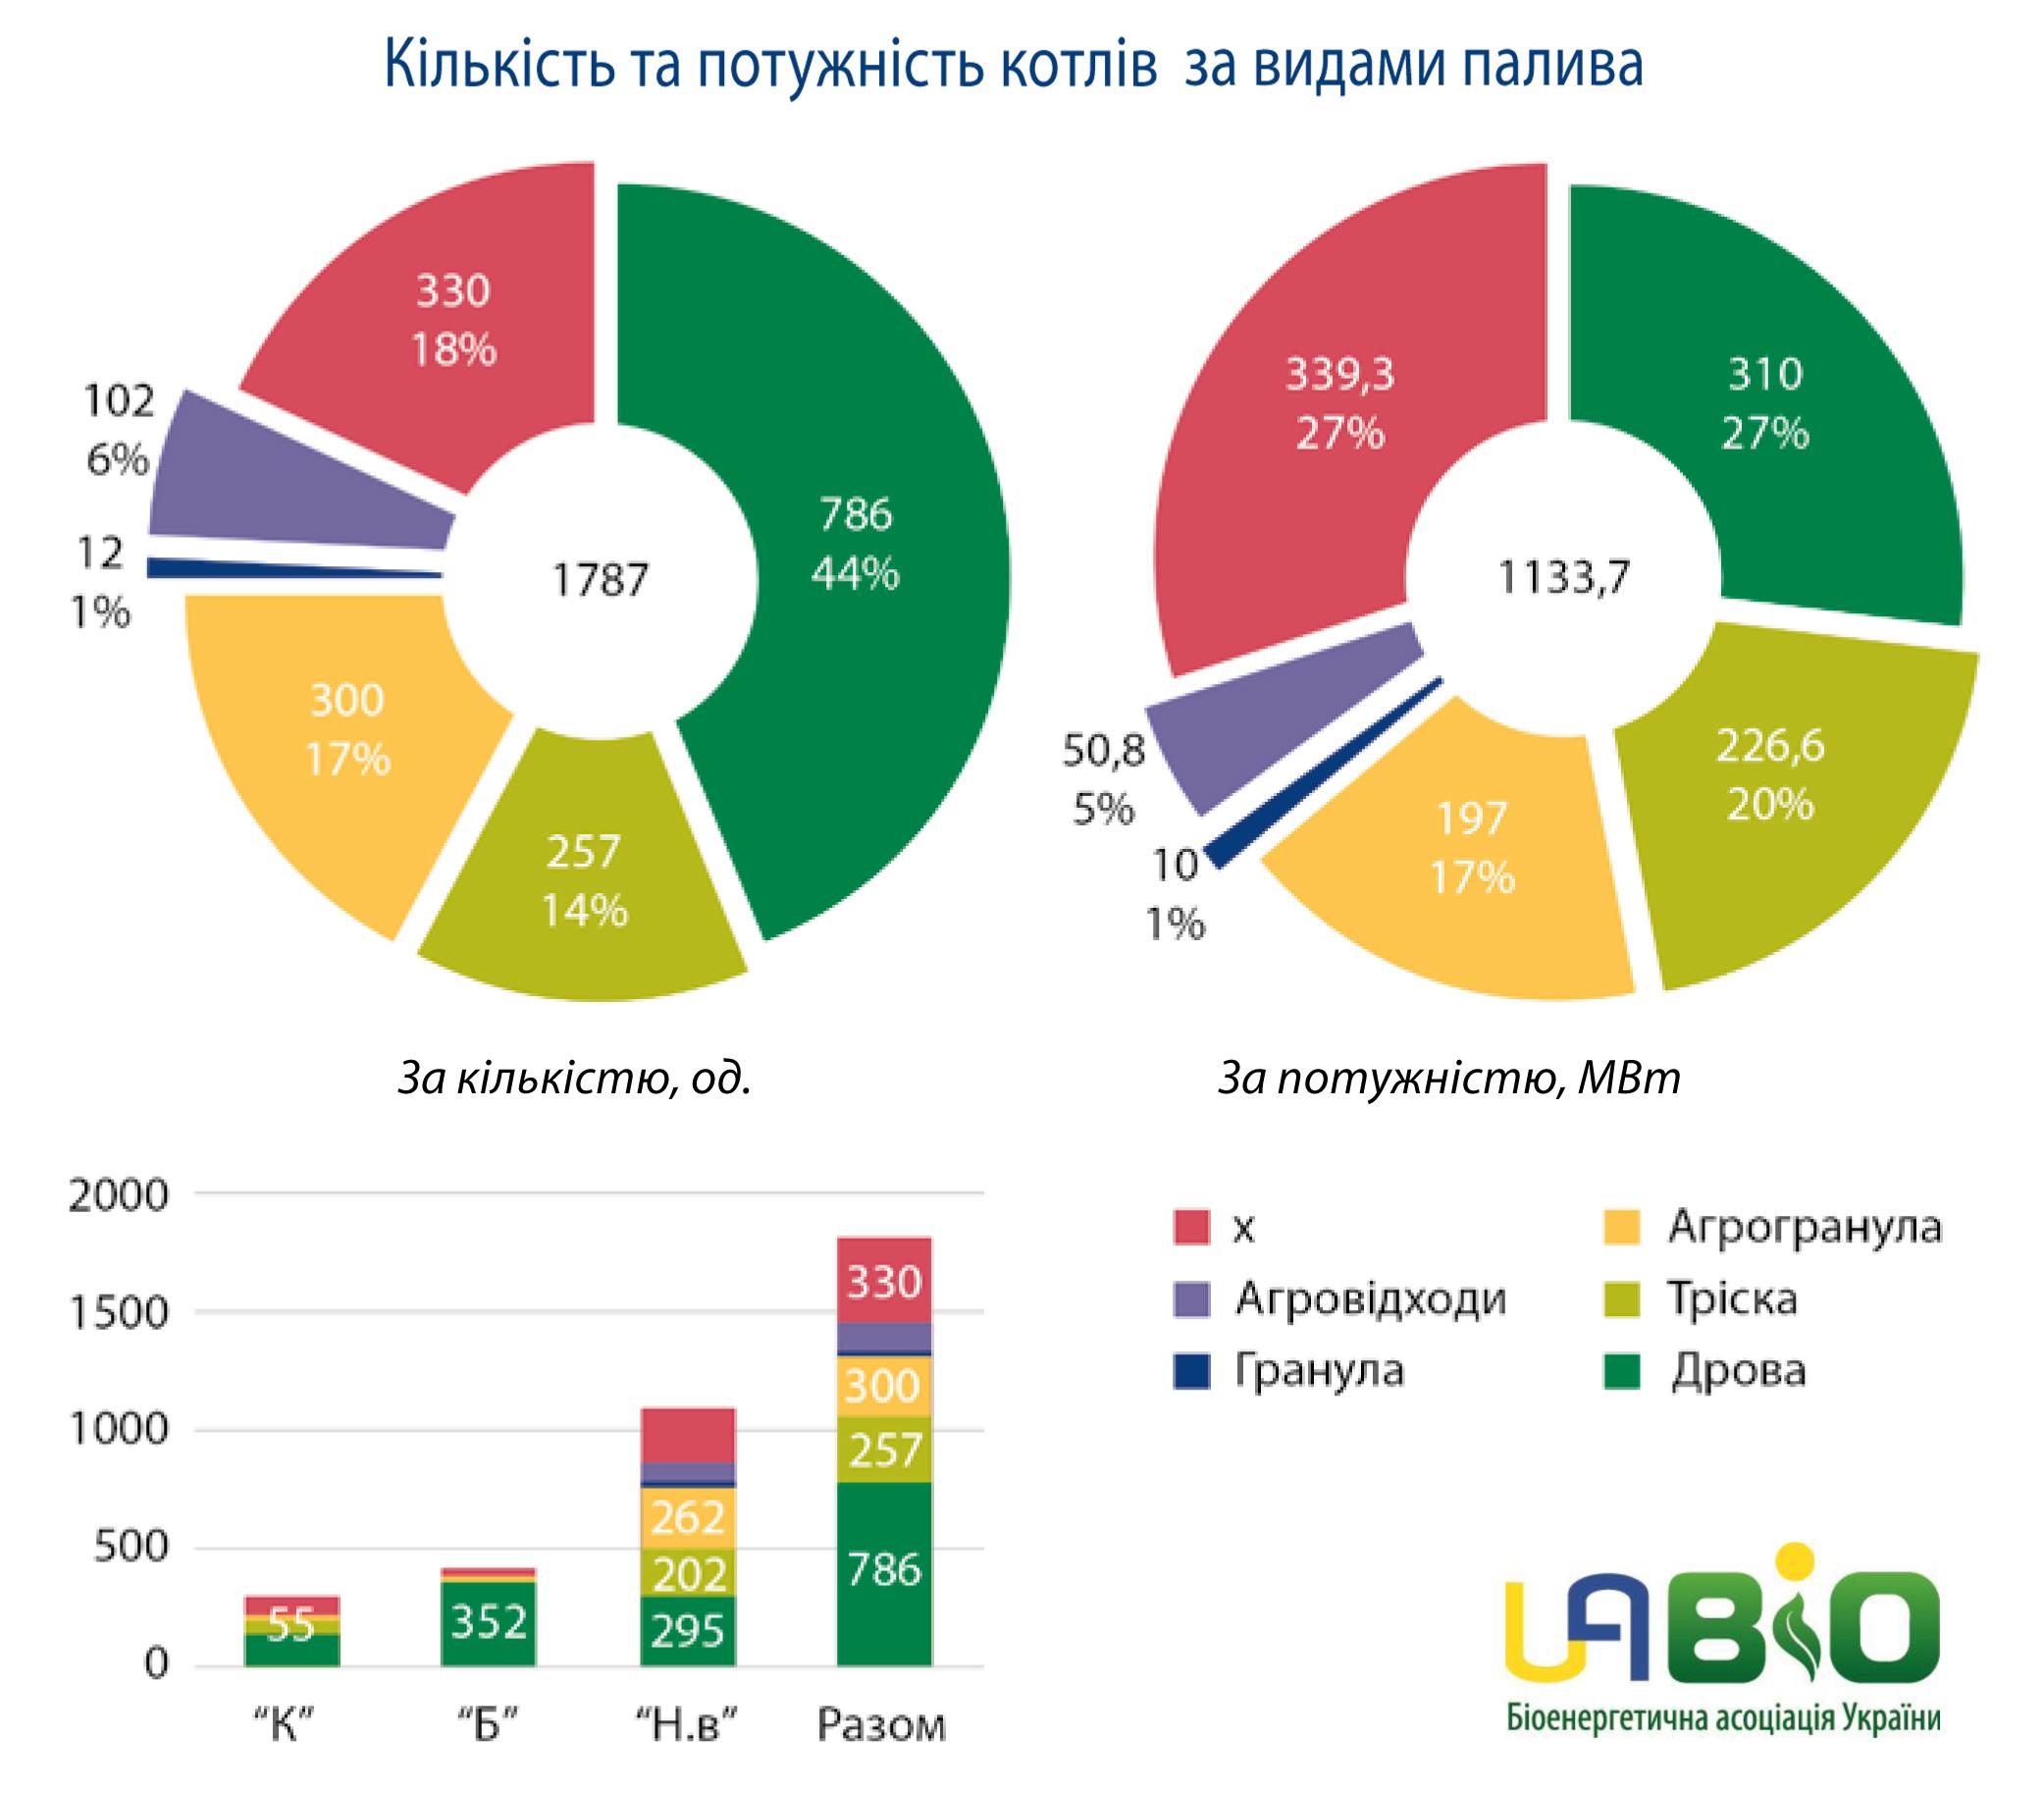 ystanovleni_tverdopalivni_kotli_v_mynicipalnomy_sektori.jpg